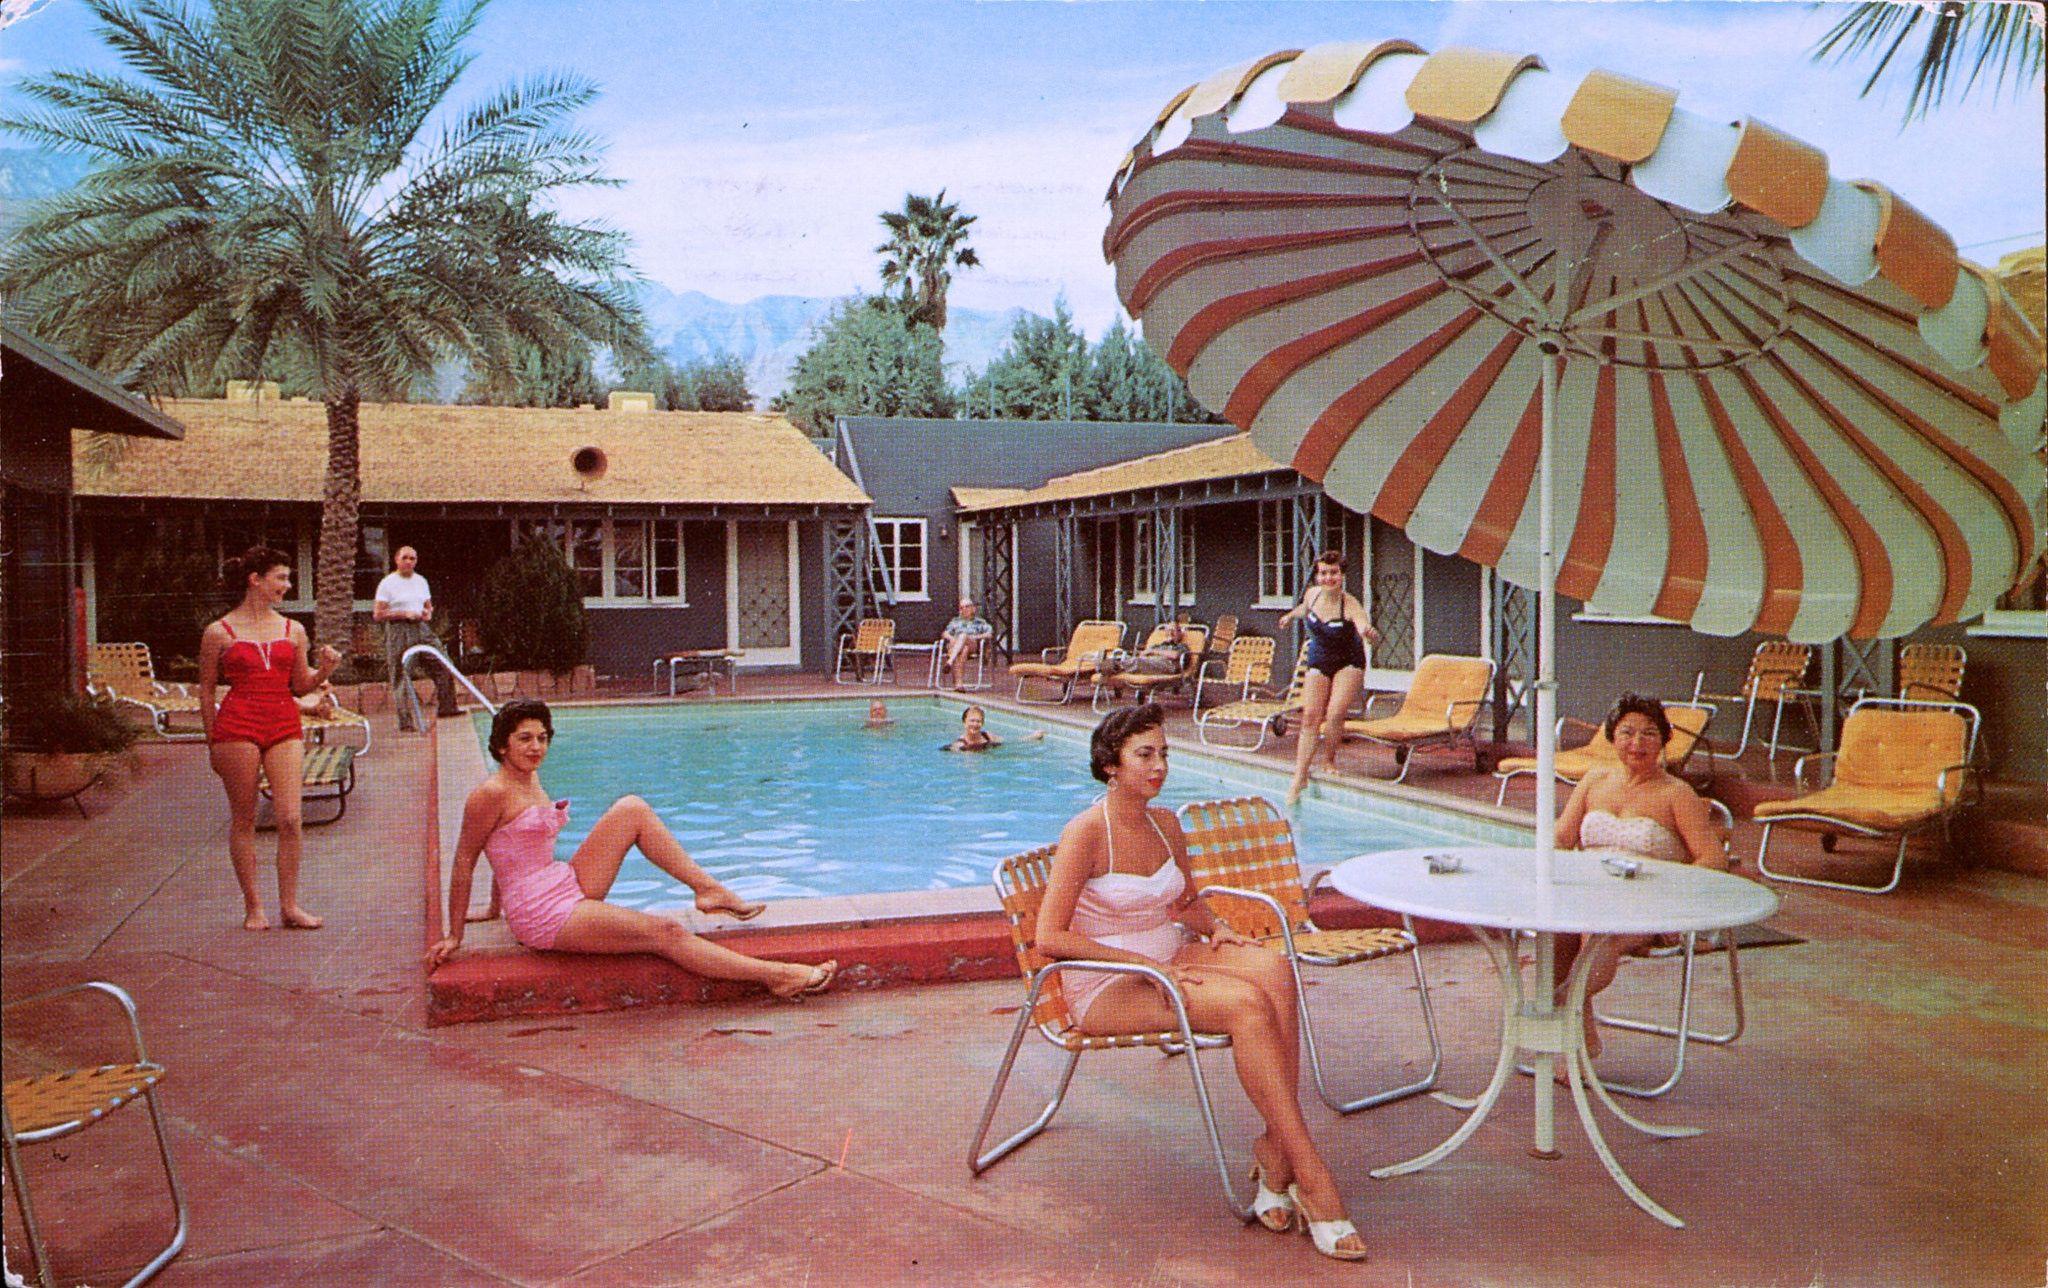 Twin Villas Palm Springs California Vintage Pool Parties